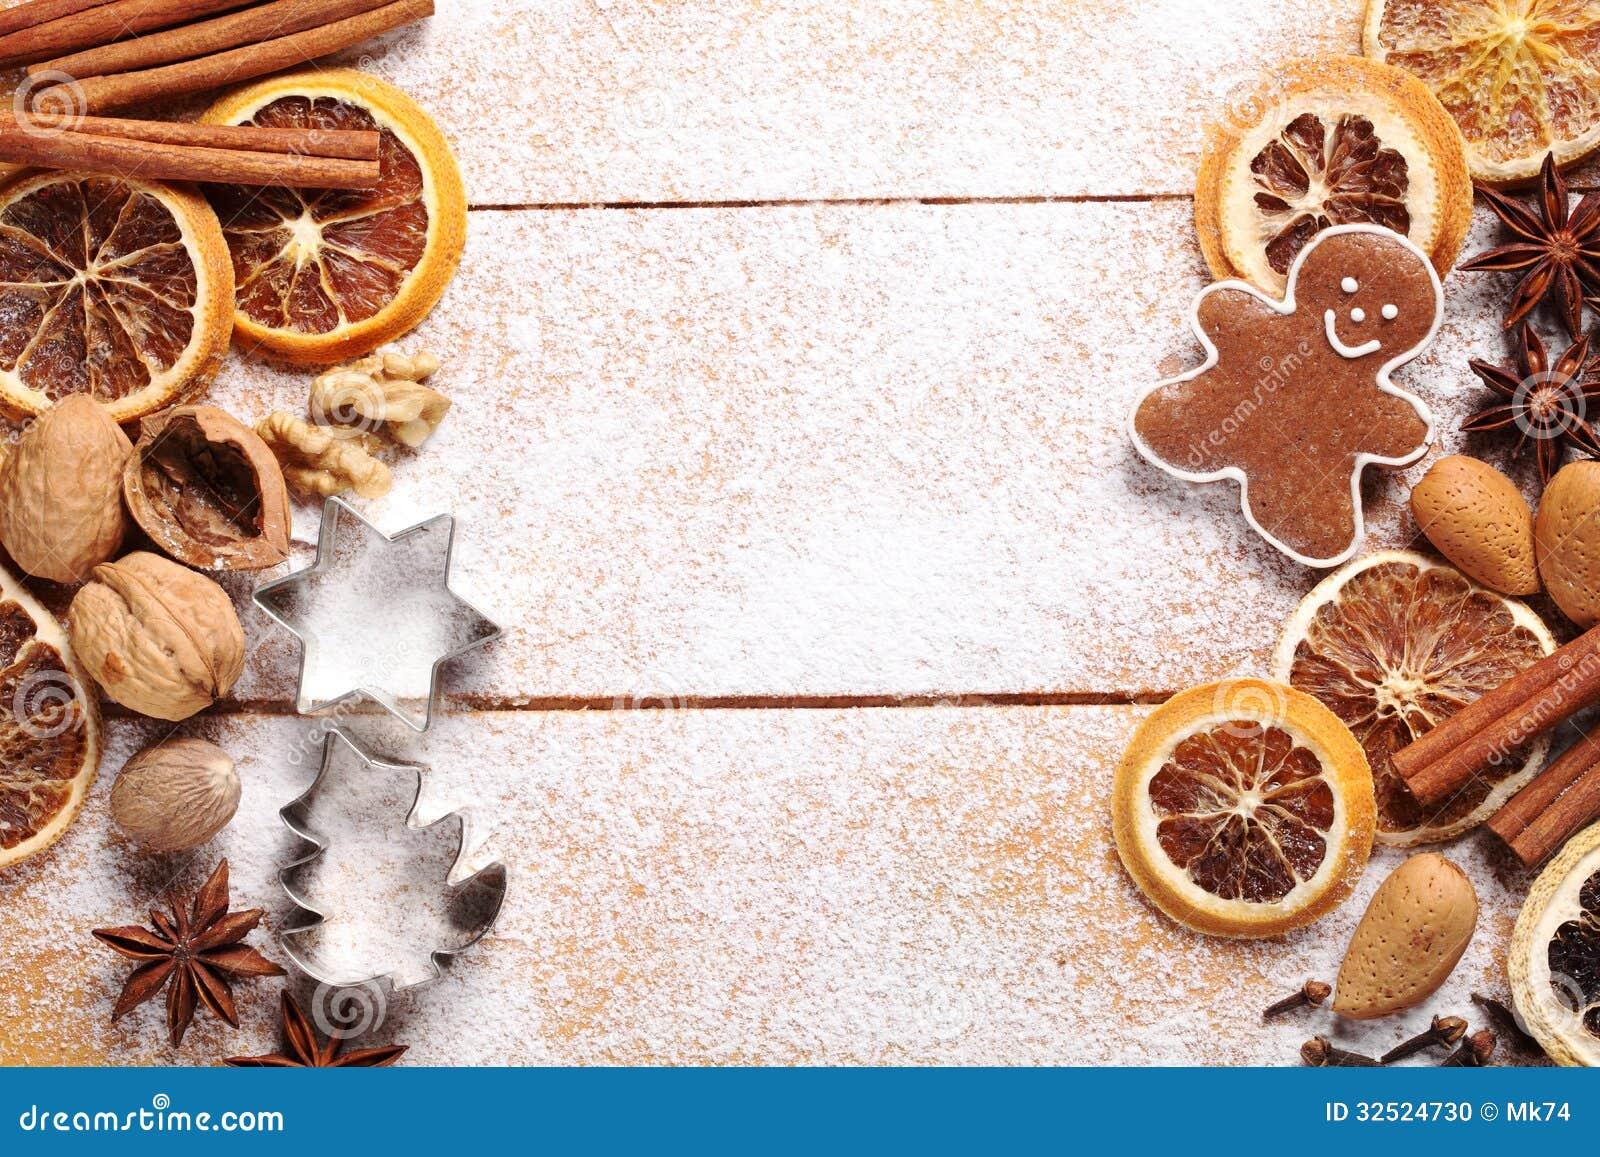 christmas baking background with - photo #12